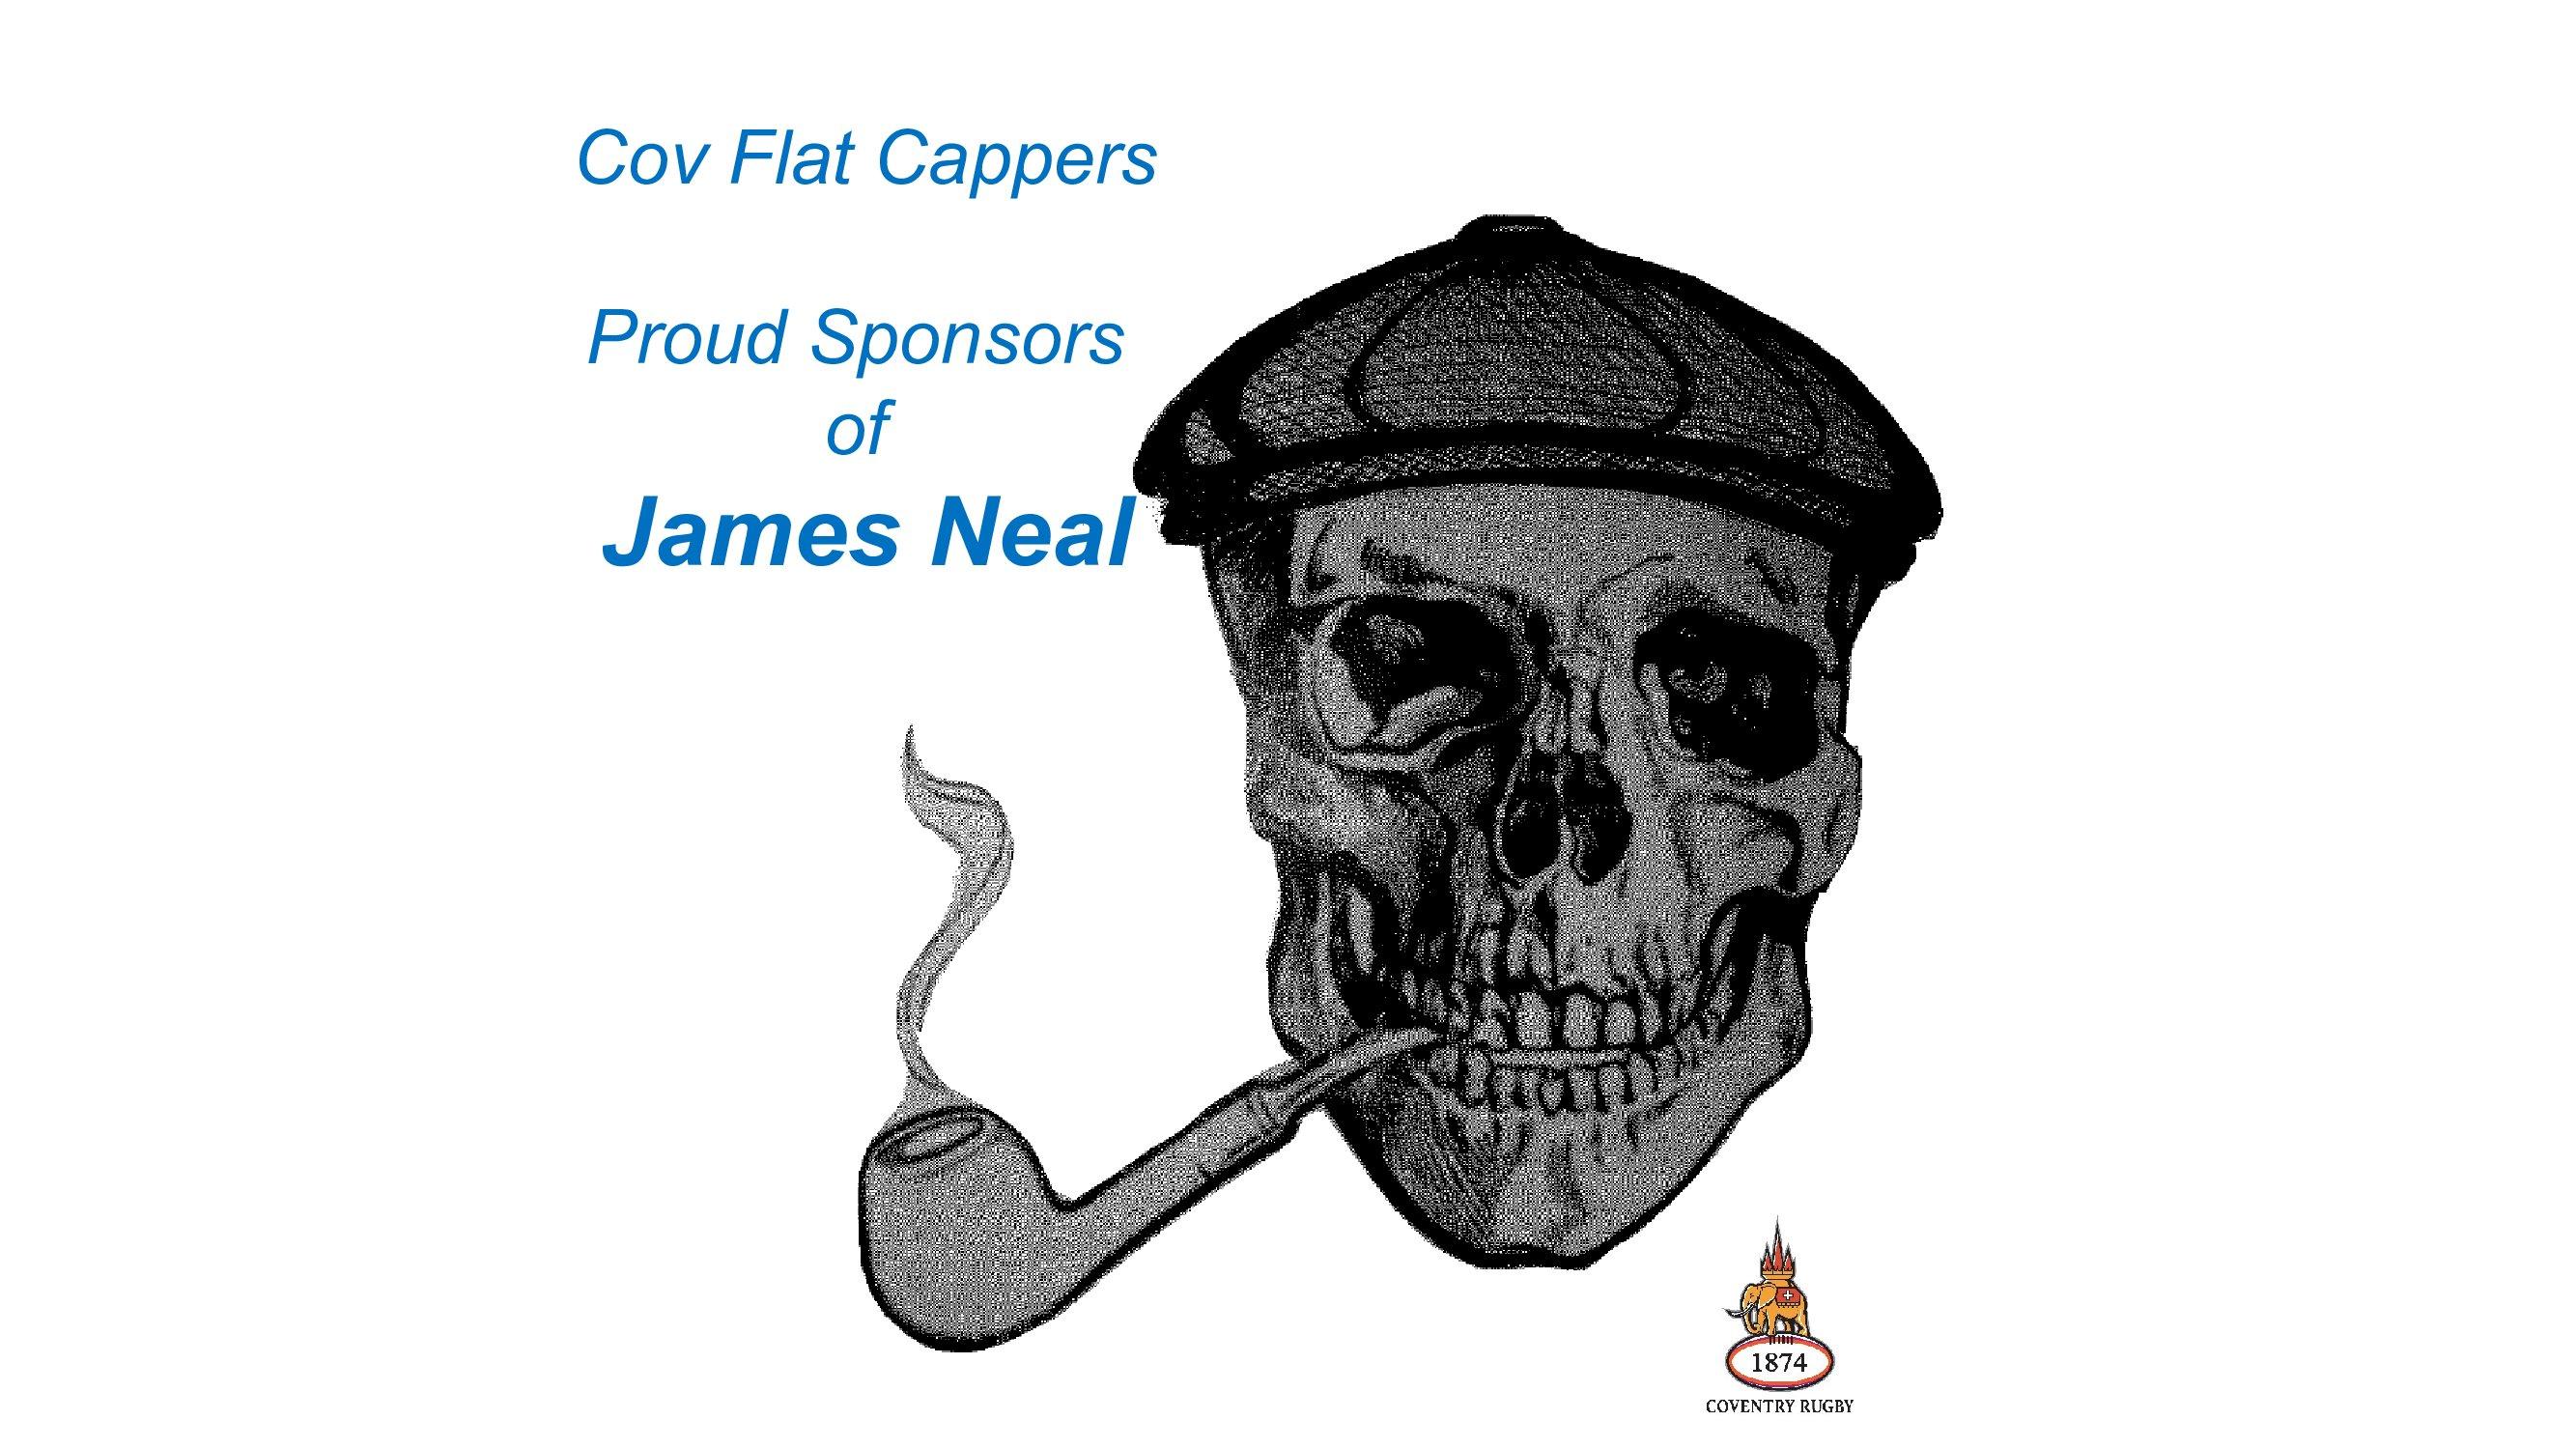 James Neal's sponsor logo